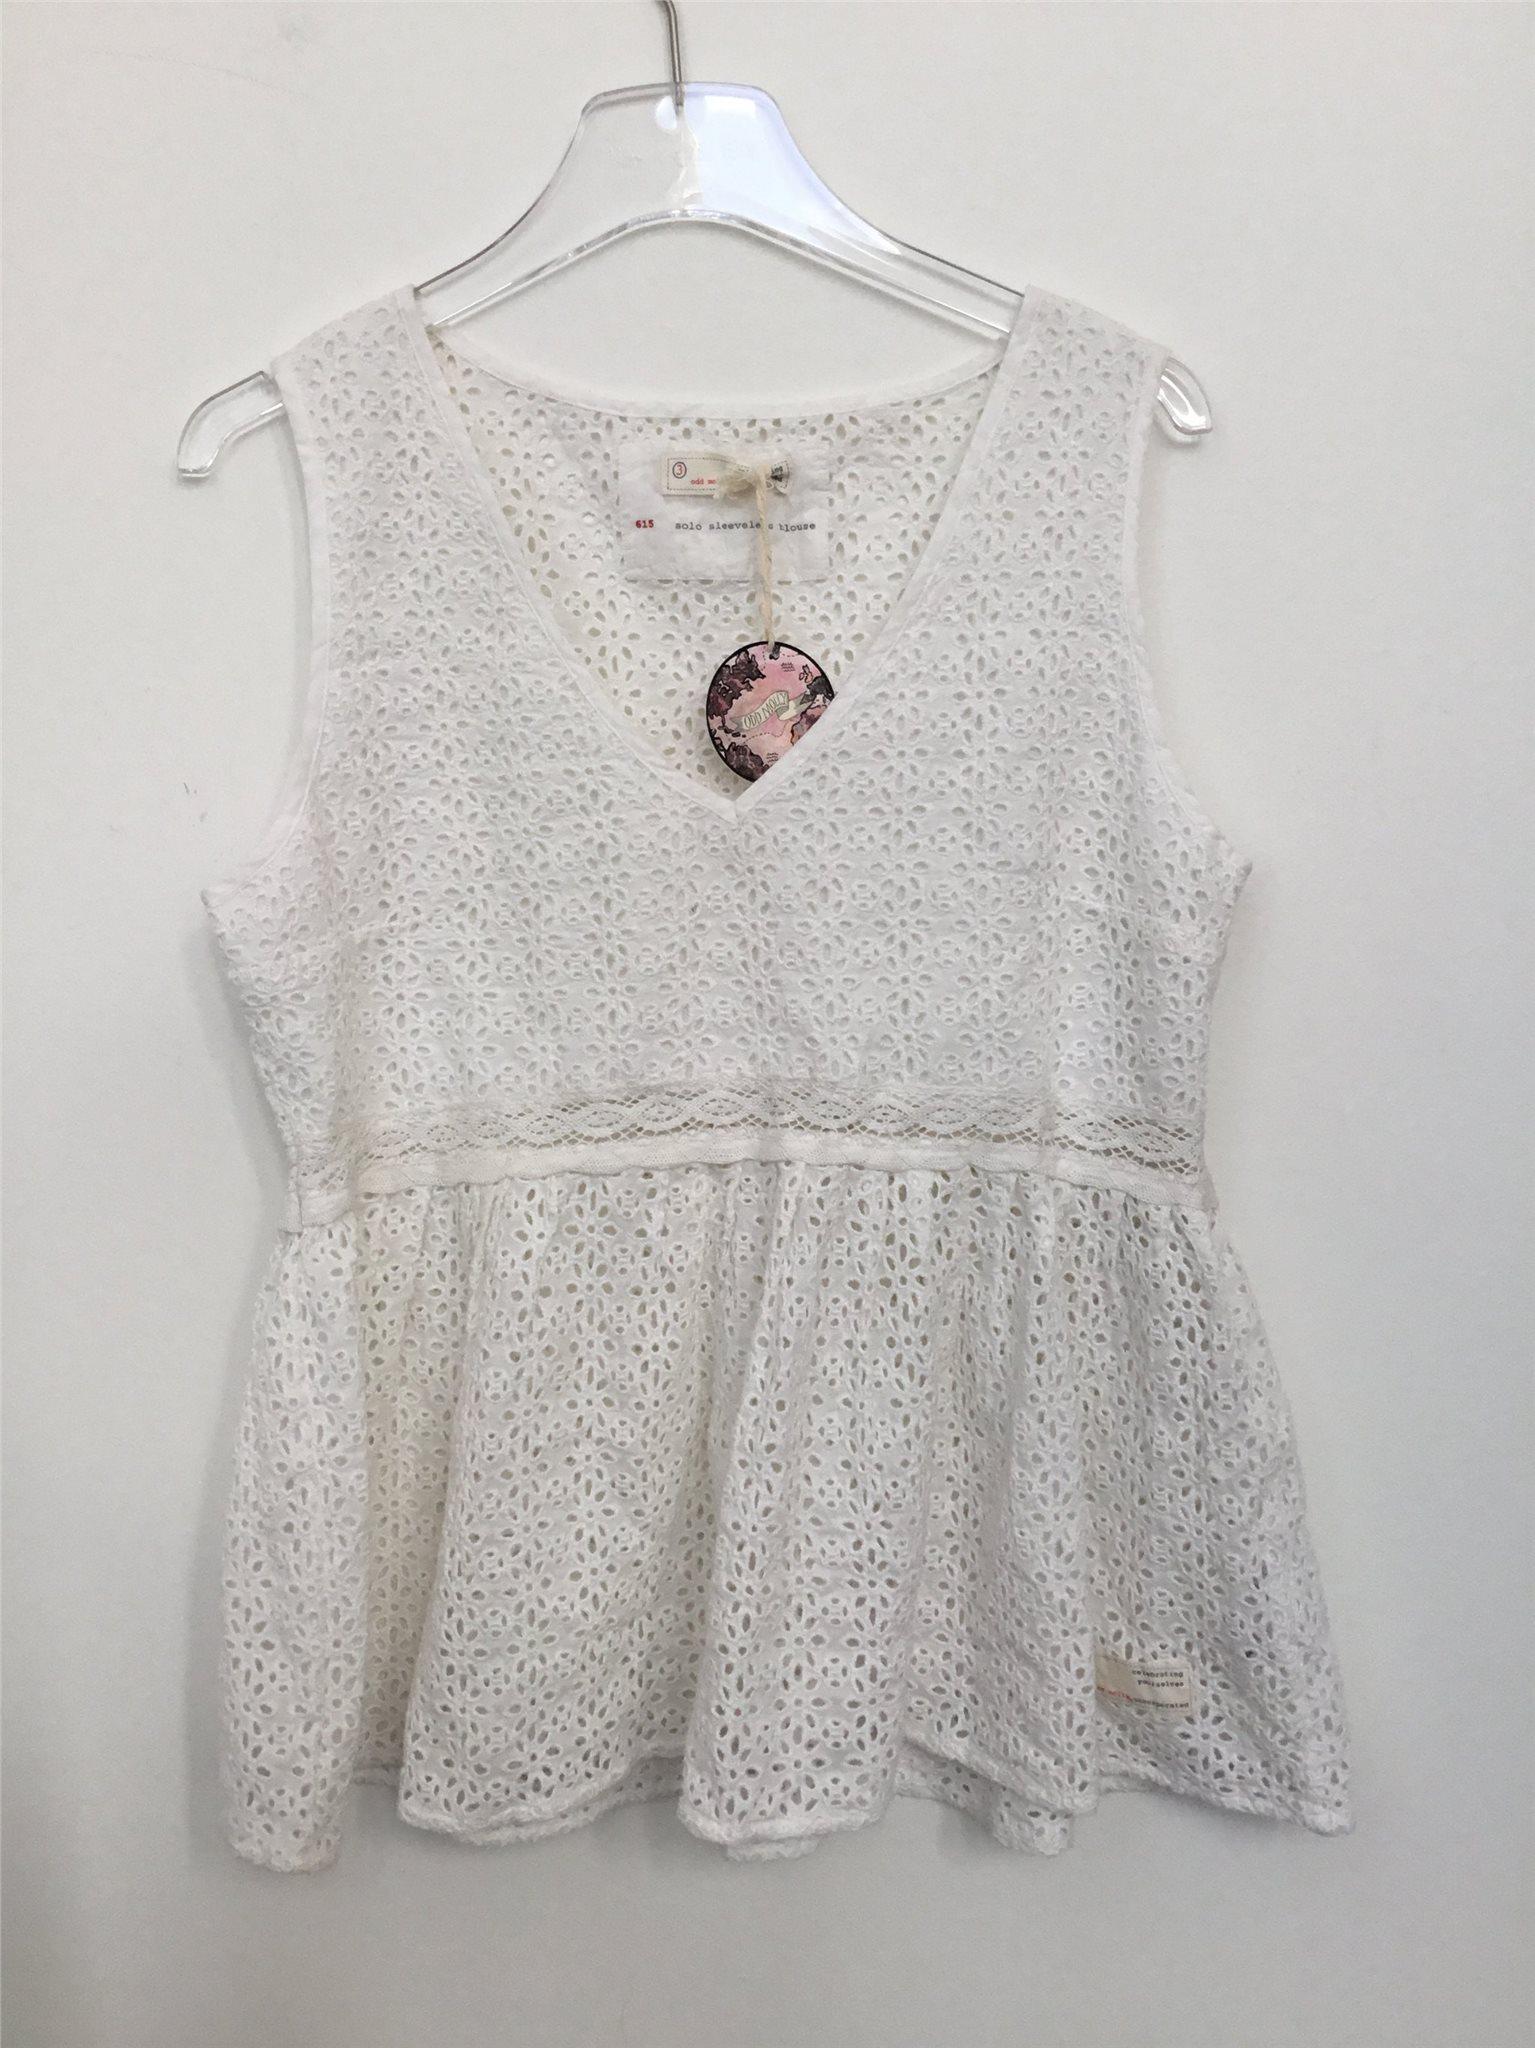 fe5f3fc0805ca4 Odd Molly 3 ny vit topp solo sleeveless blouse (343768569) ᐈ Köp på ...